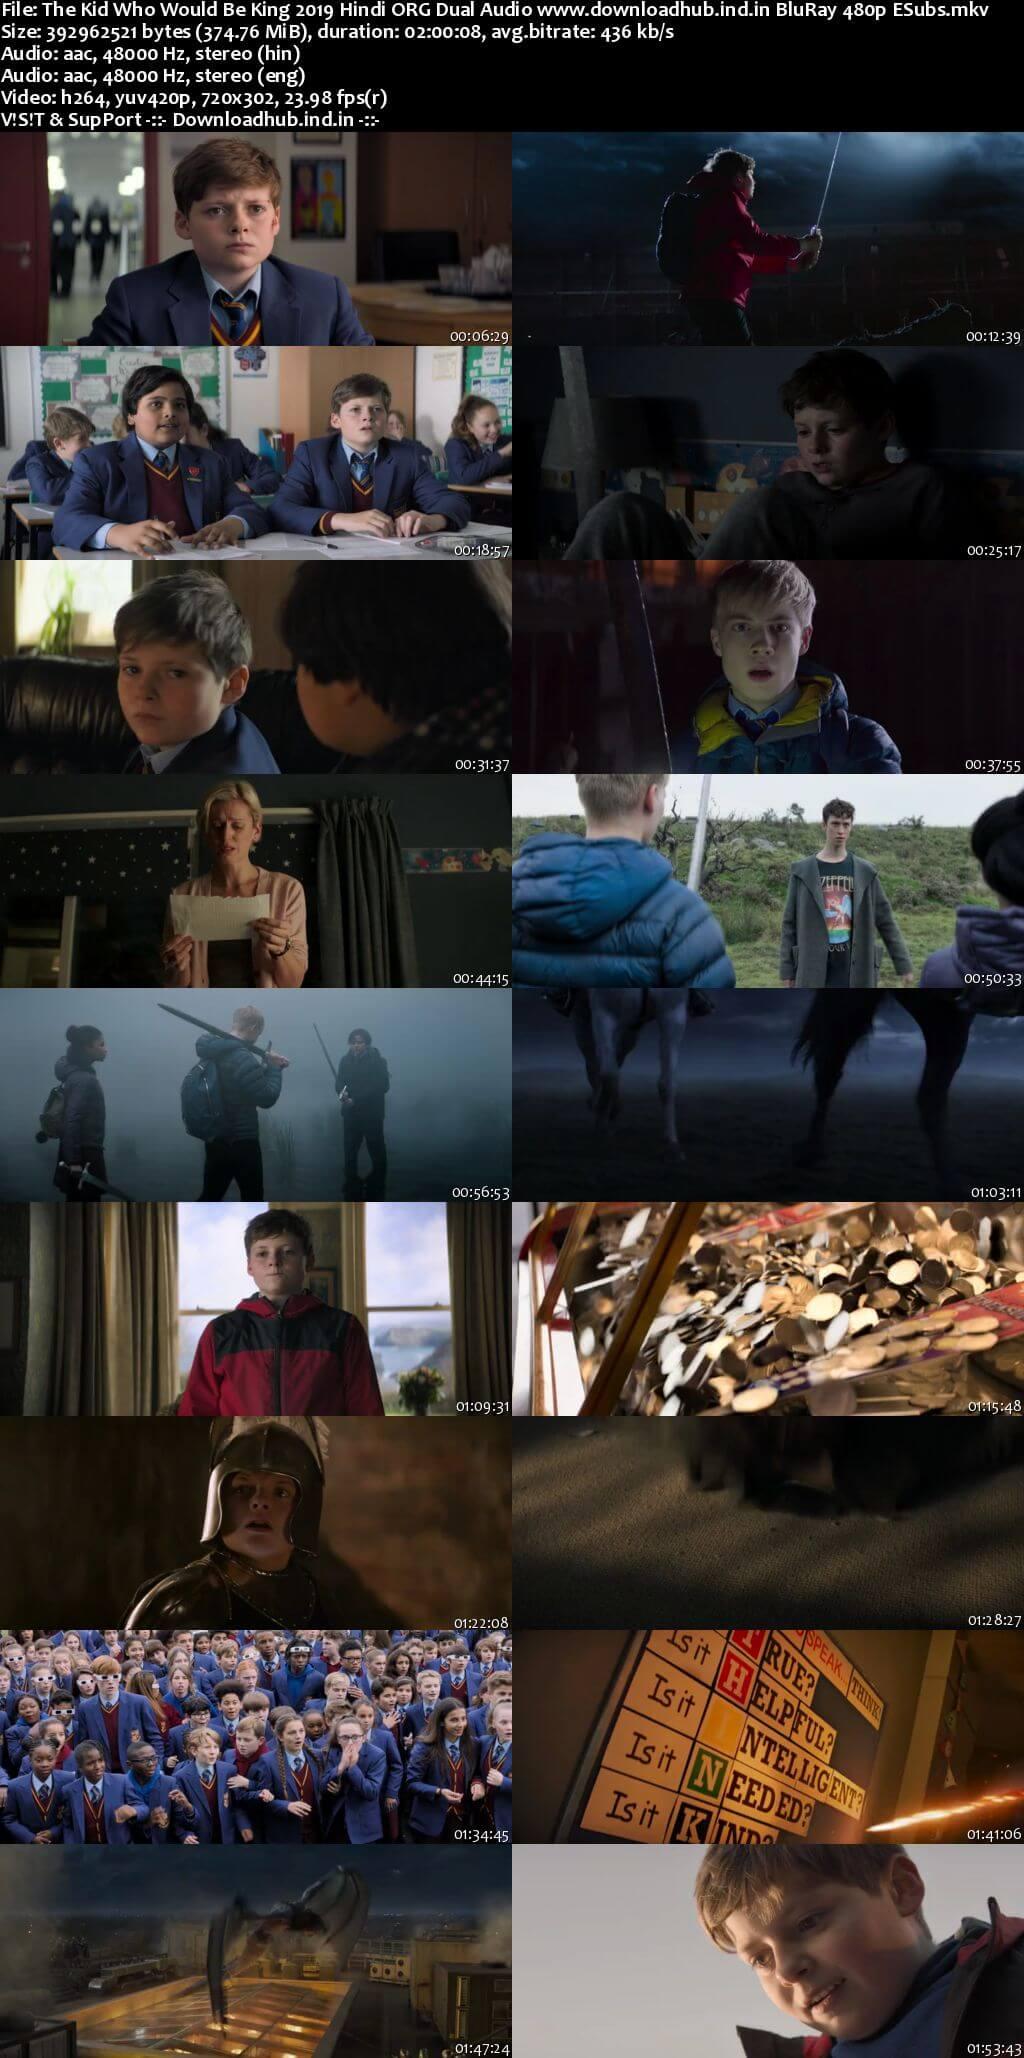 The Kid Who Would Be King 2019 Hindi ORG Dual Audio 350MB BluRay 480p ESubs